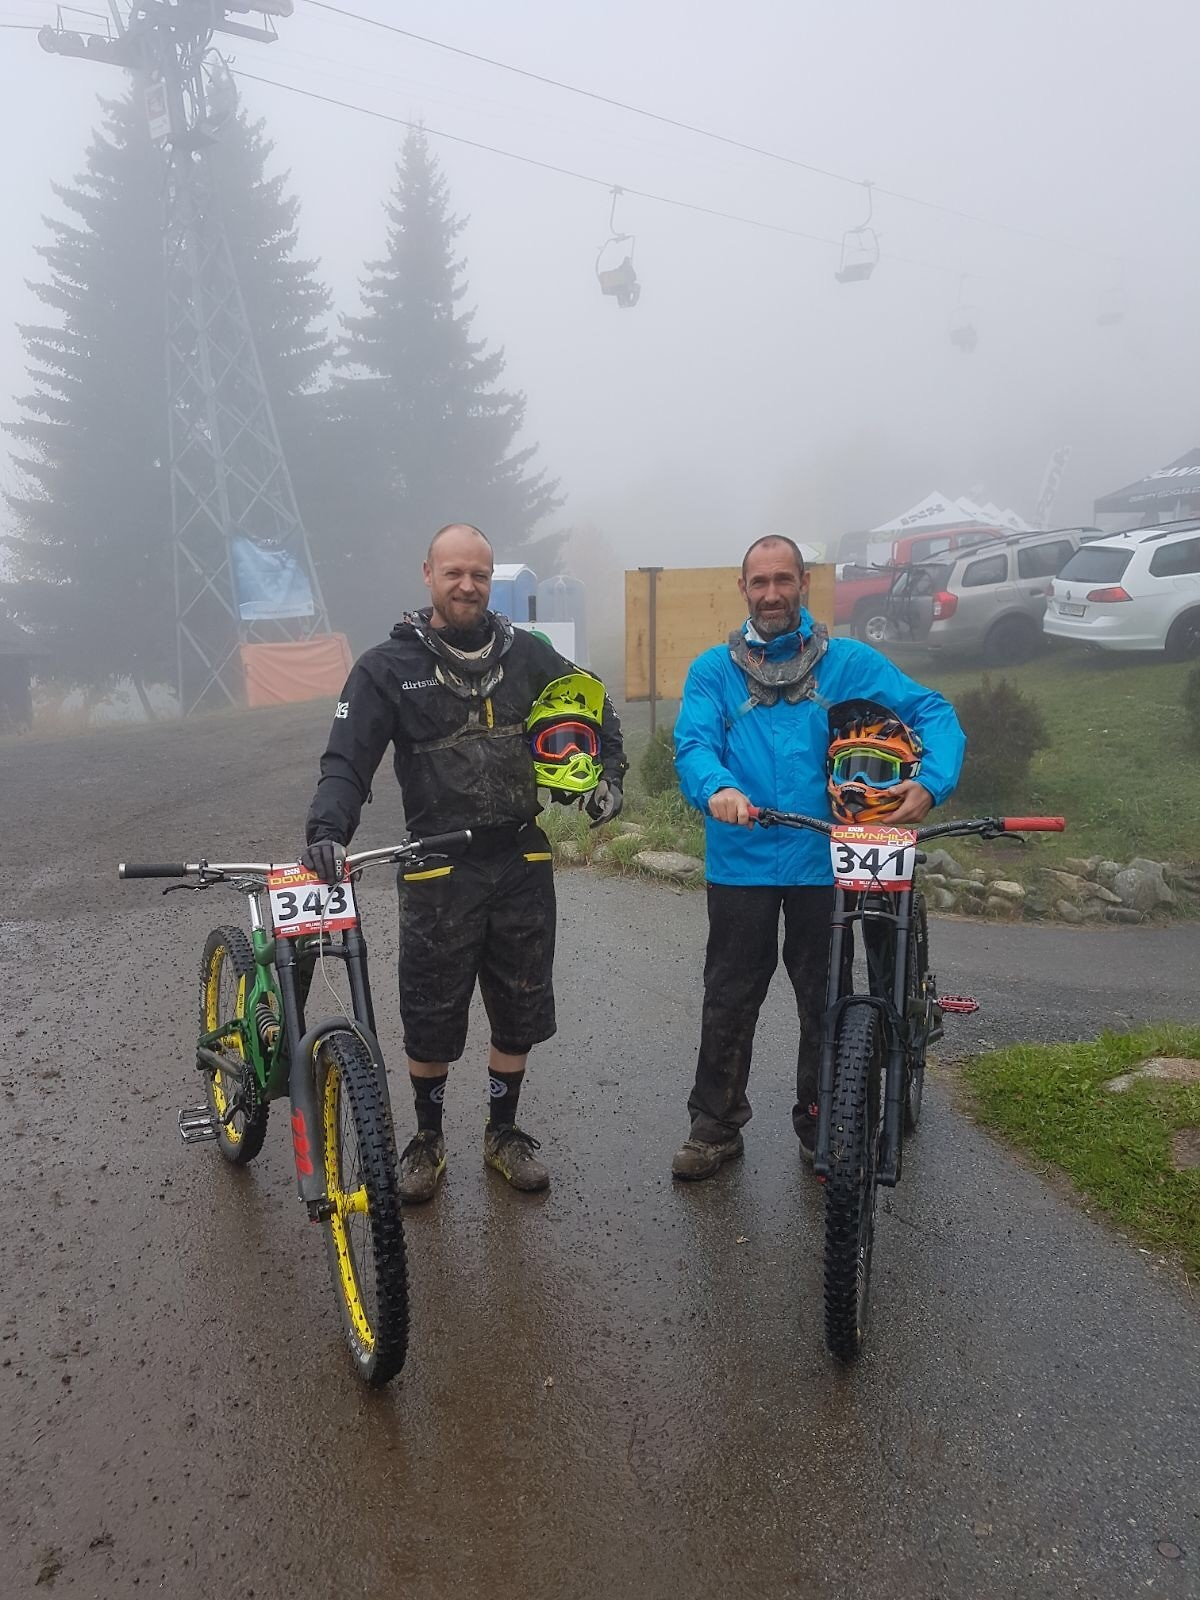 IXS DH Cup Bellwald - Tiberius - Mountain Biking Pictures - Vital MTB